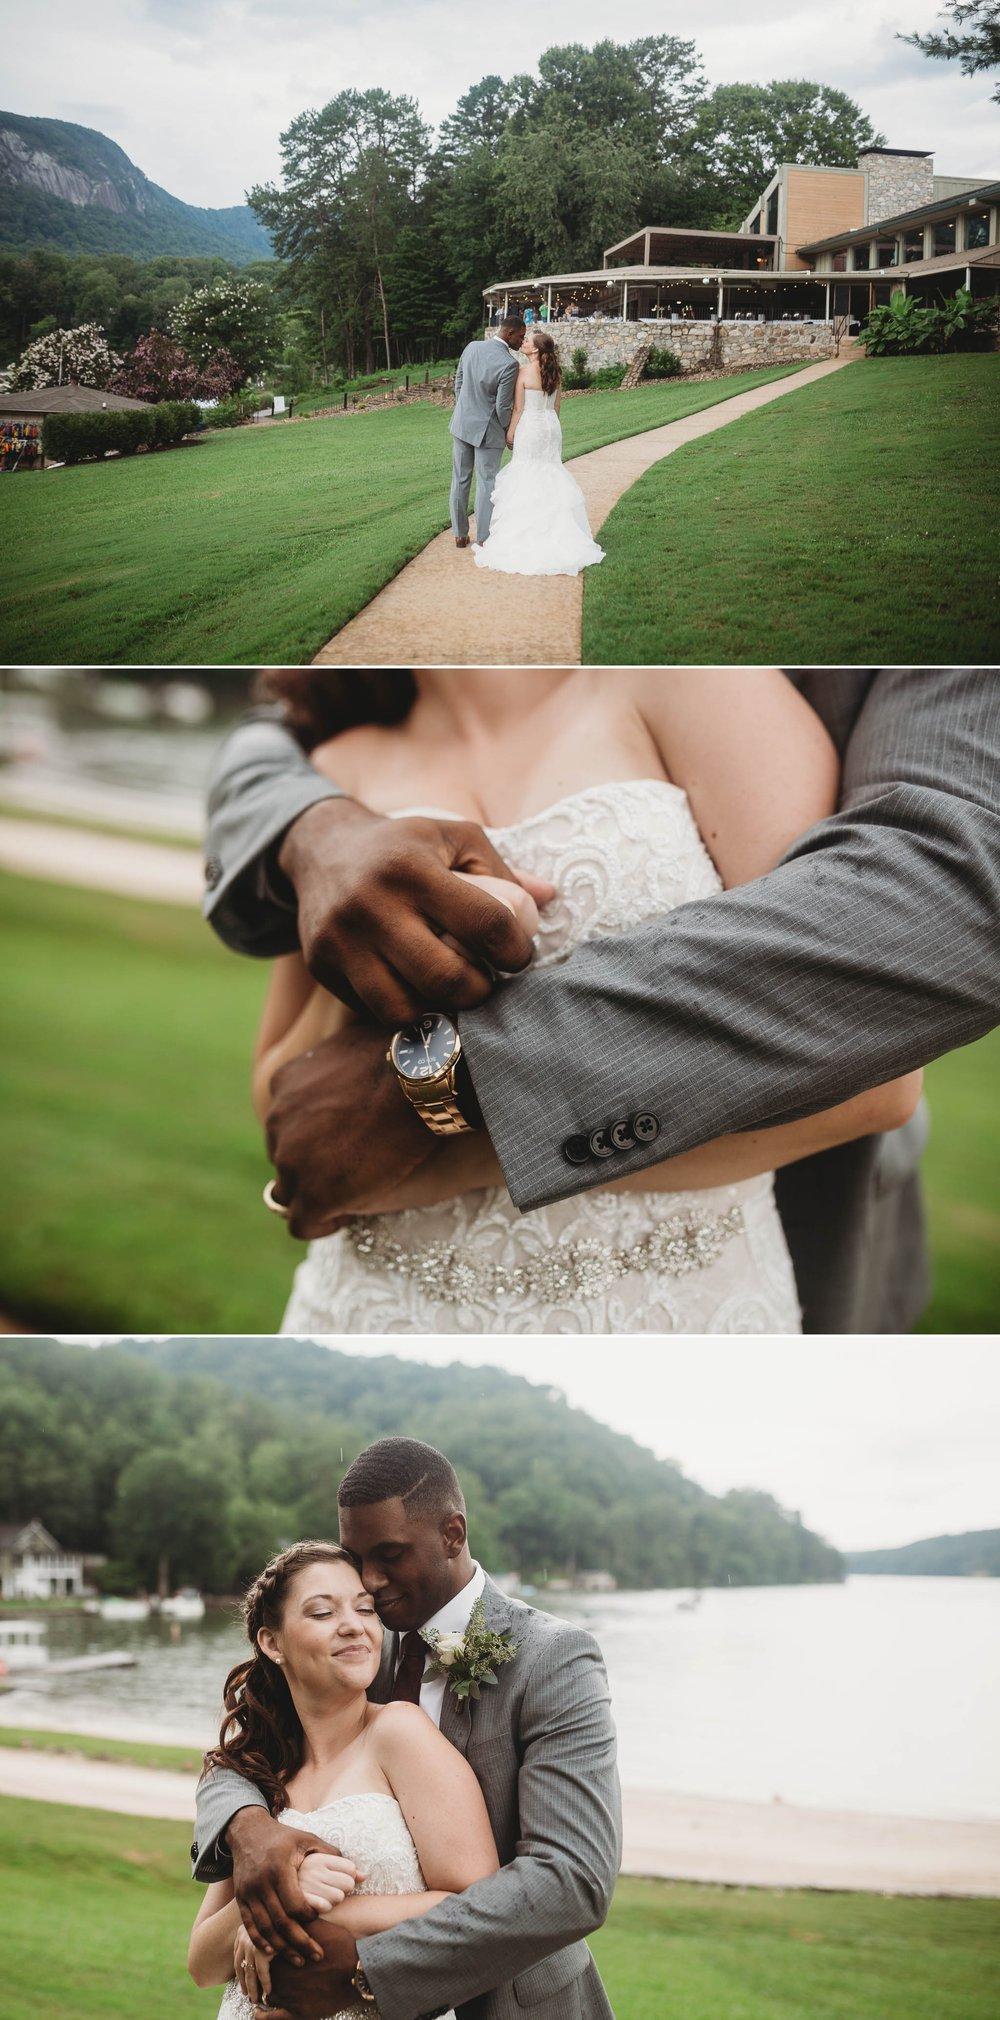 Bride and Groom Portraits Rachel + Jamison - Rumbling Bald Resort, Lake Lure, NC - Asheville, North Carolina Wedding Photographer